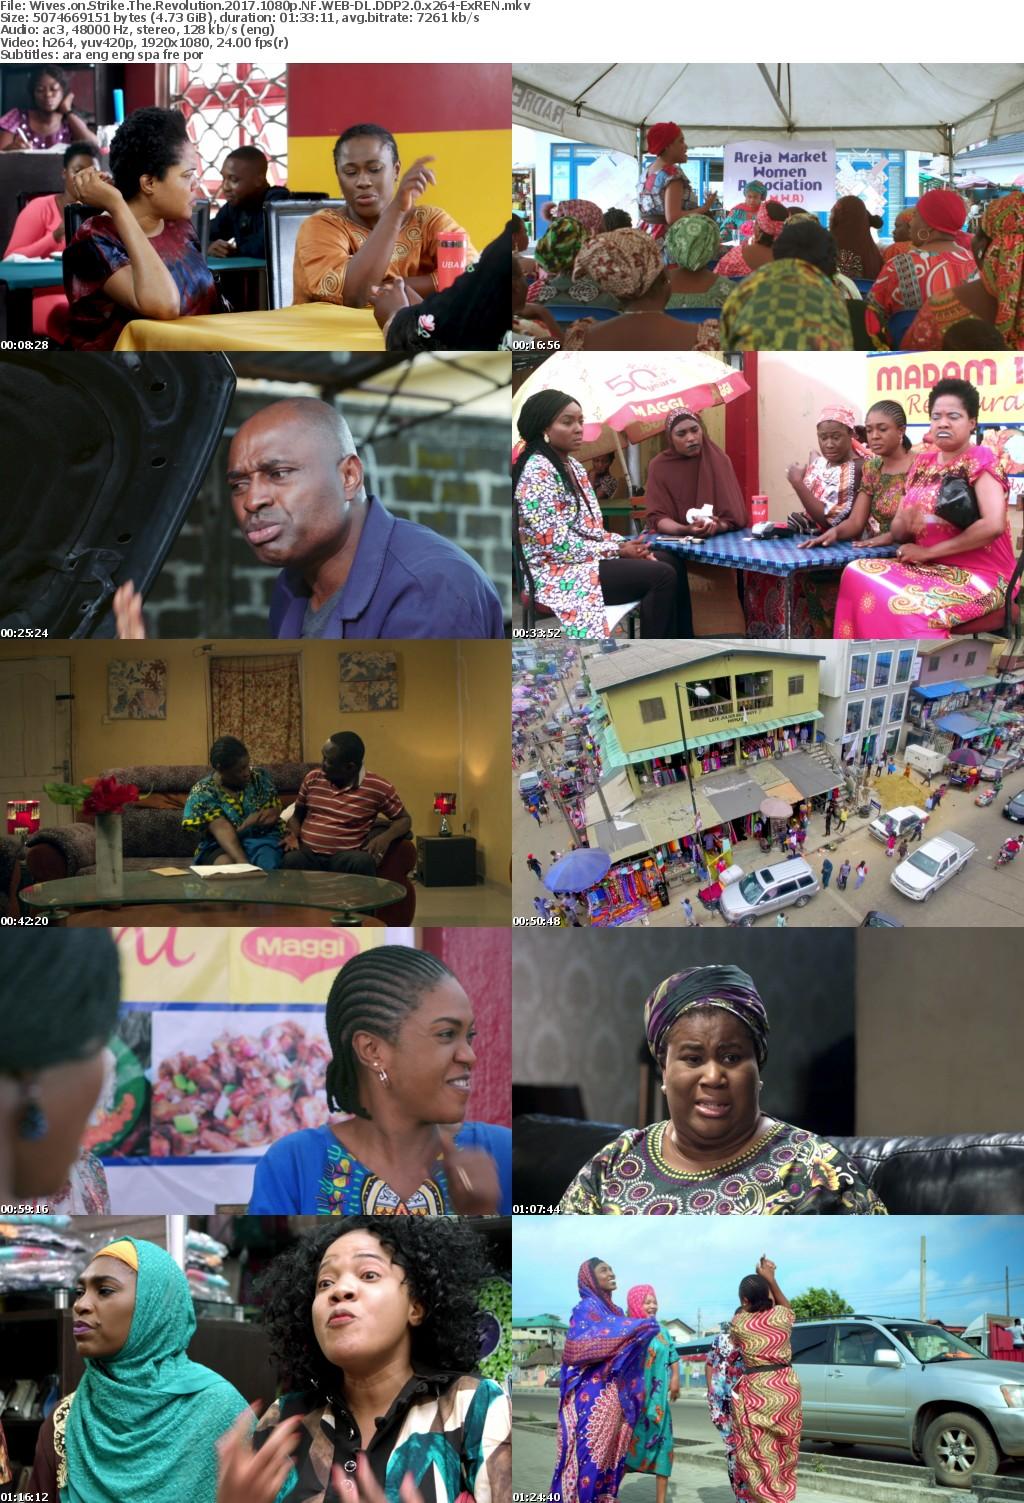 Wives on Strike The Revolution (2017) 1080p NF WEBRip DDP2.0 x264-EXREN